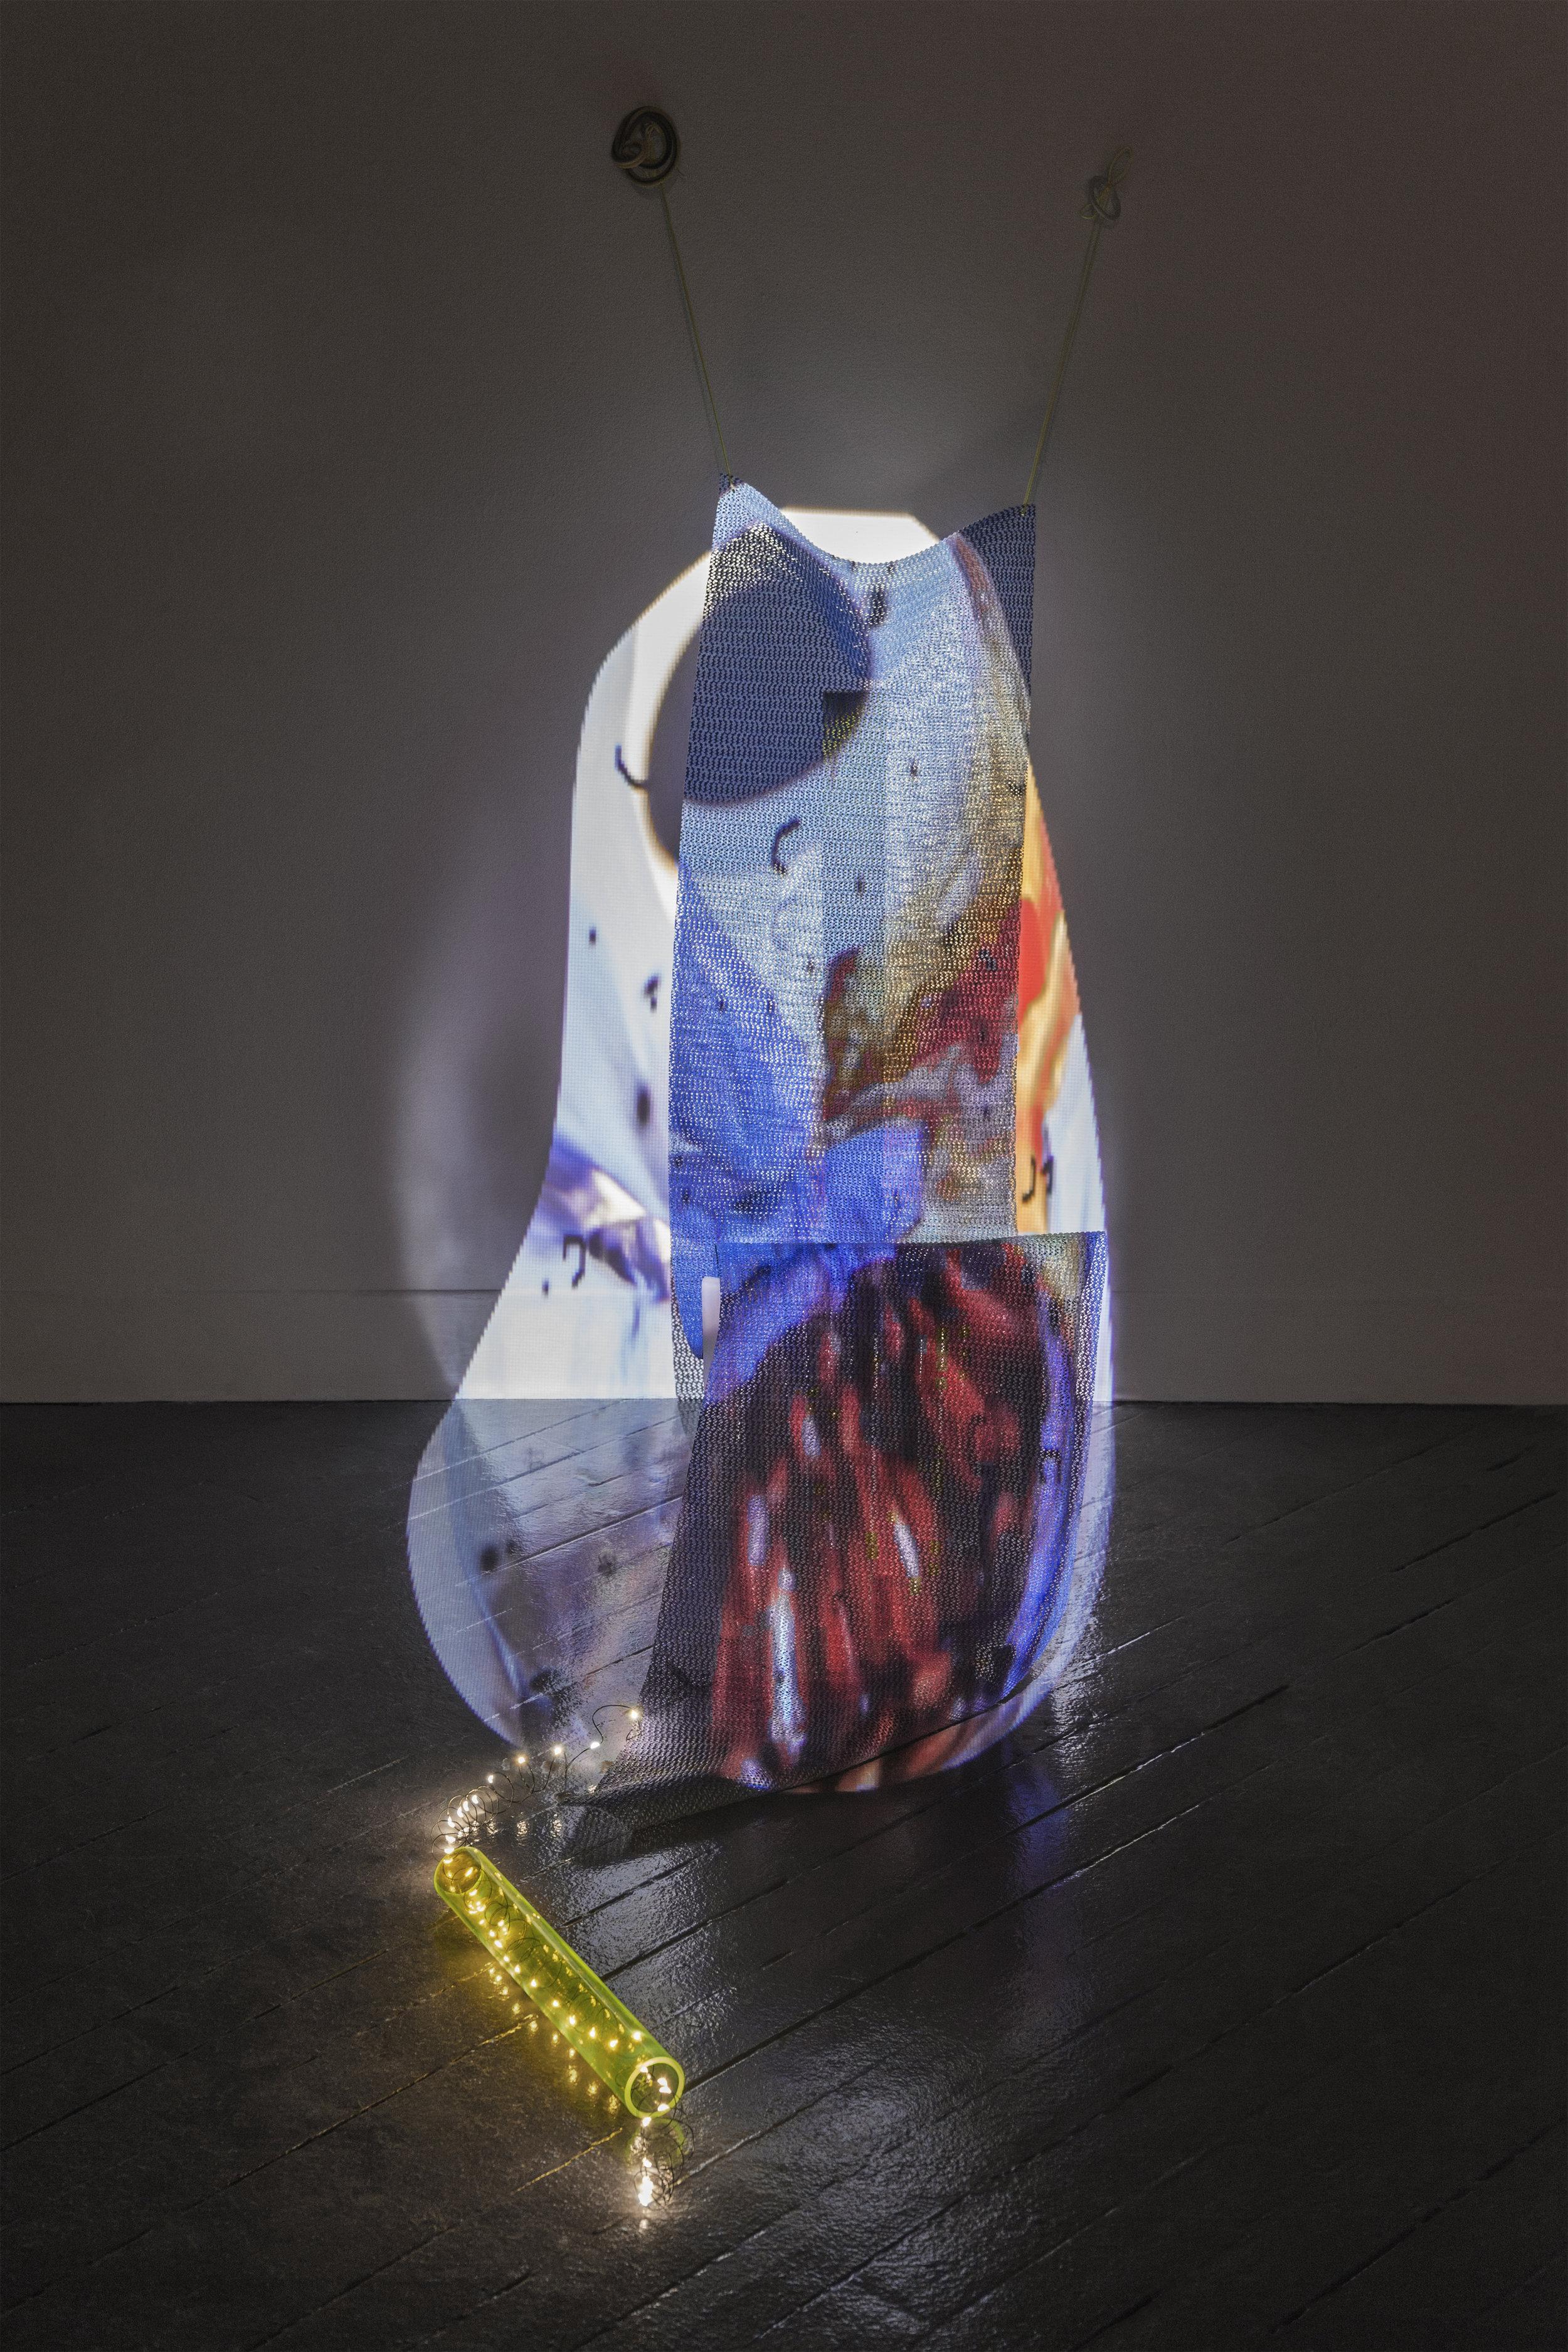 Untitled (Pomegranate-Kite), 2015, still of video sculpture including shelf lining, plastic, tiles, LED light string, dimensions variable